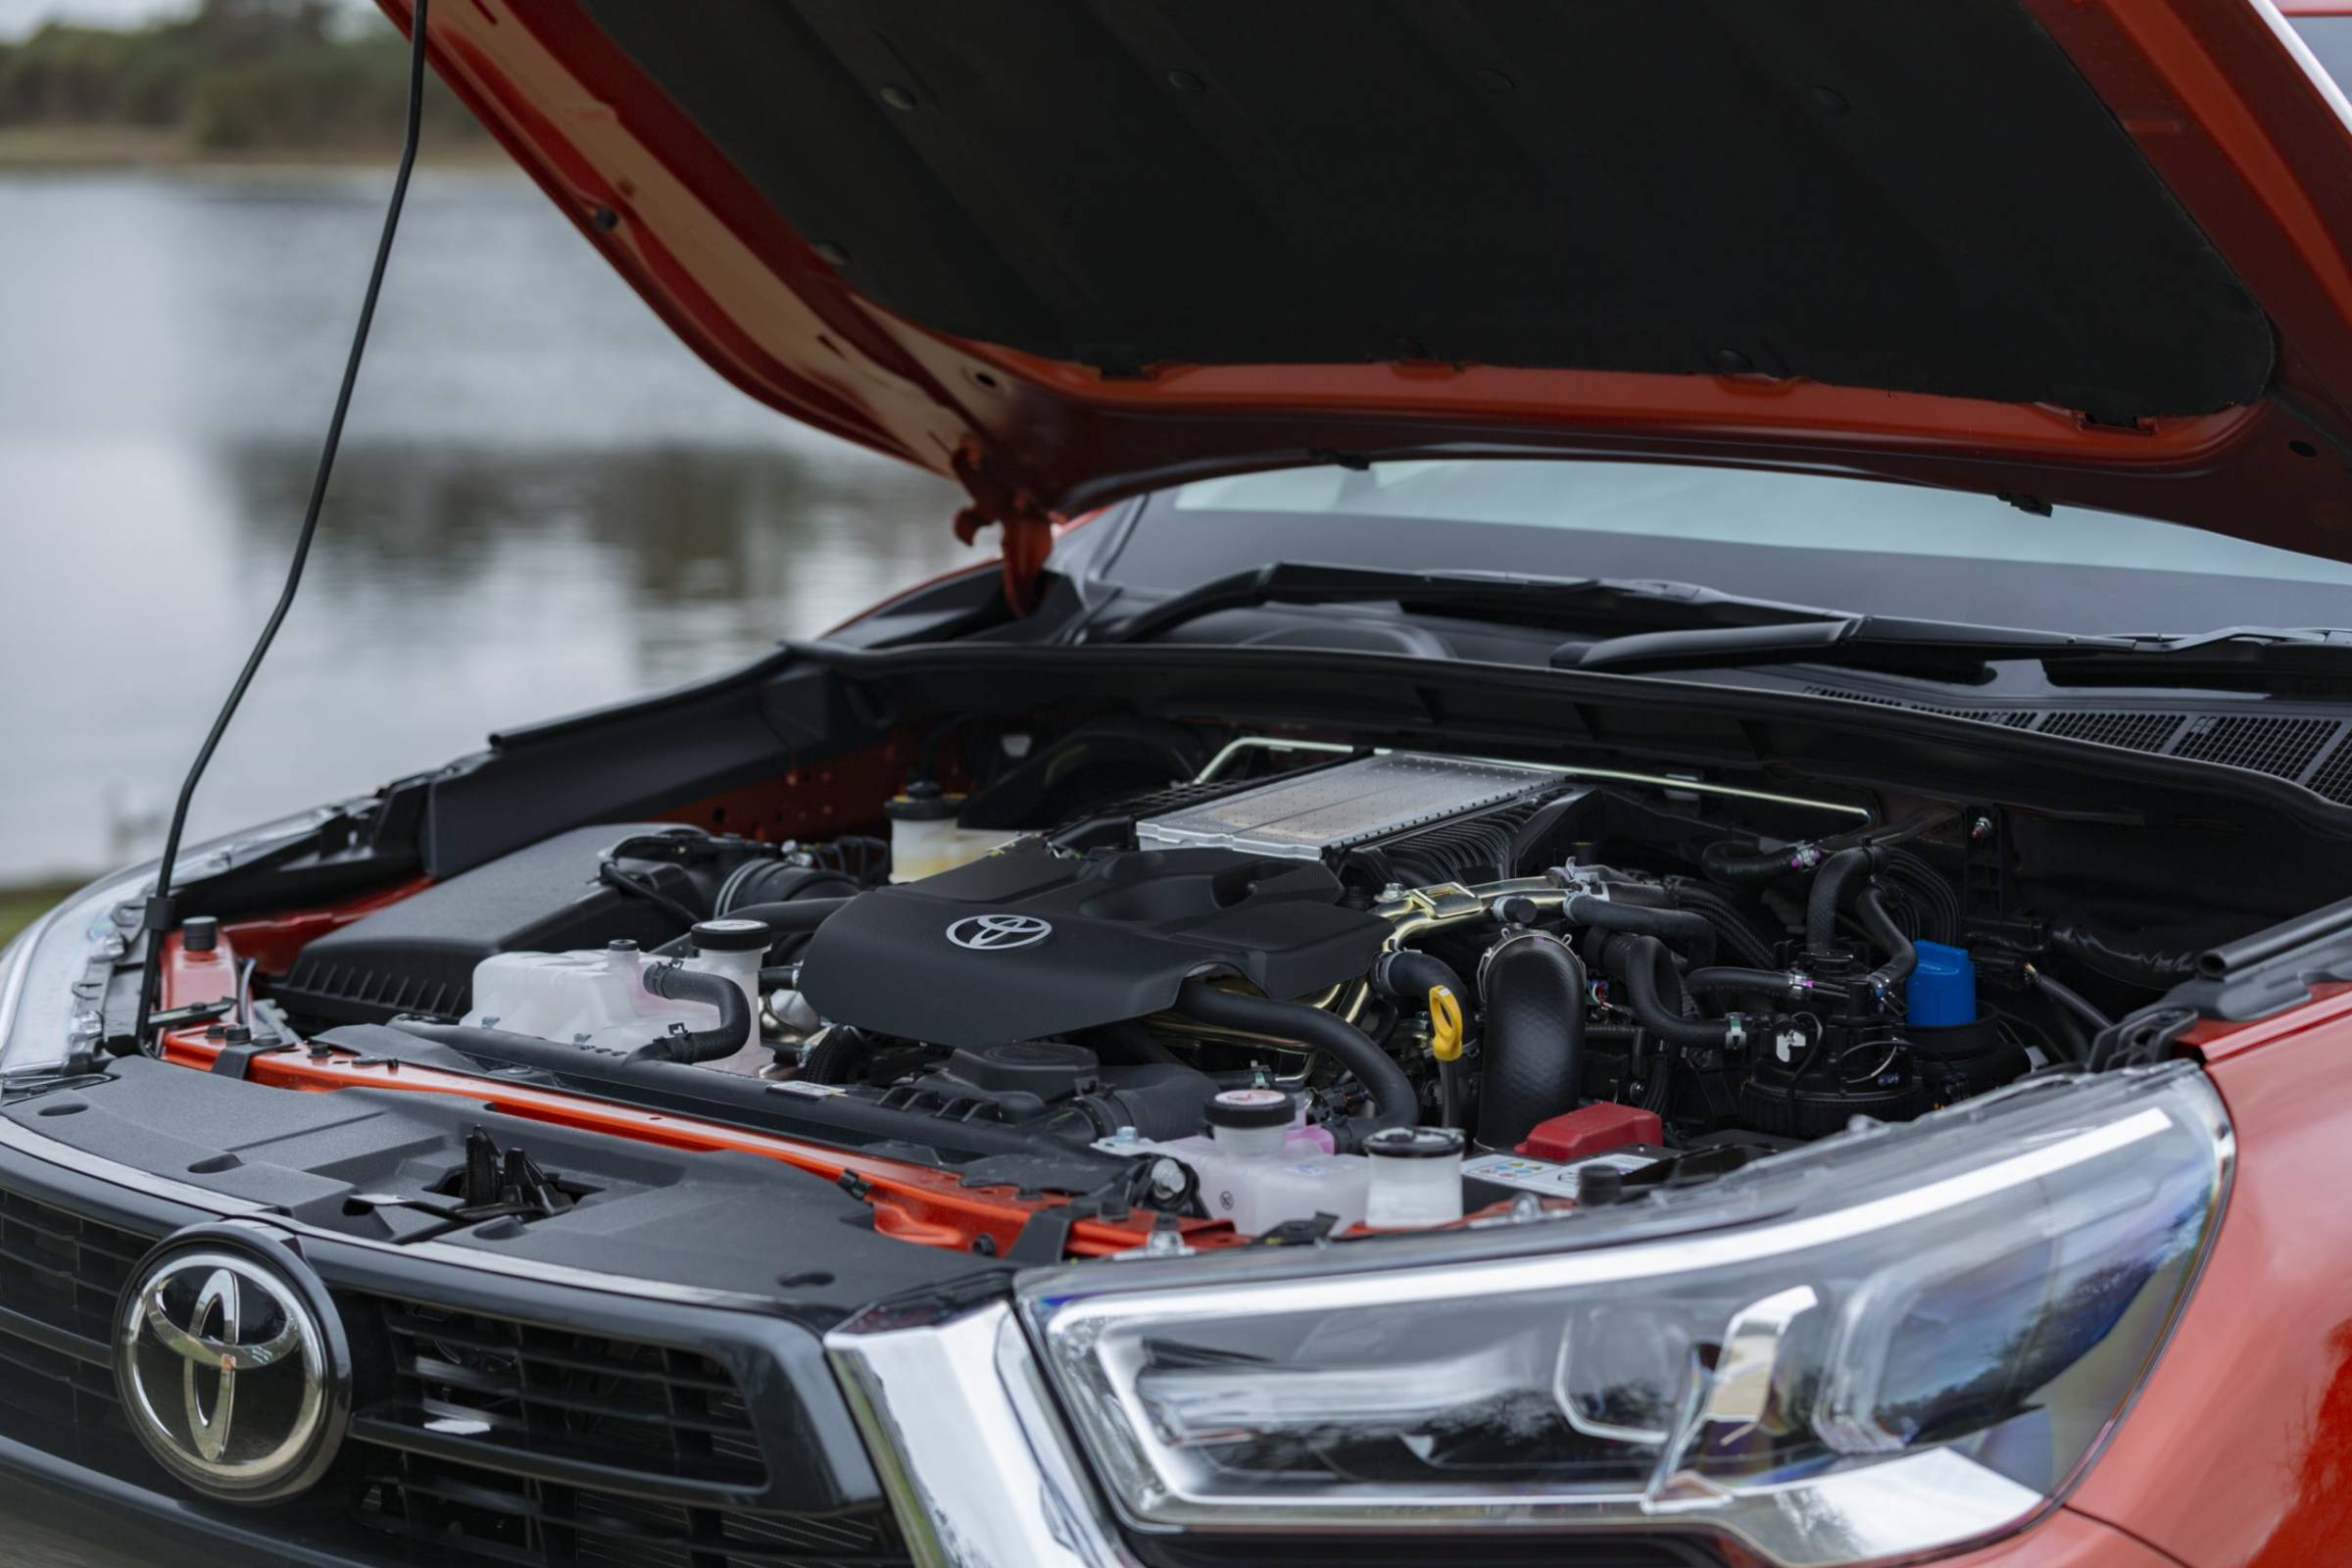 Toyota Diesel: 2020 Hilux